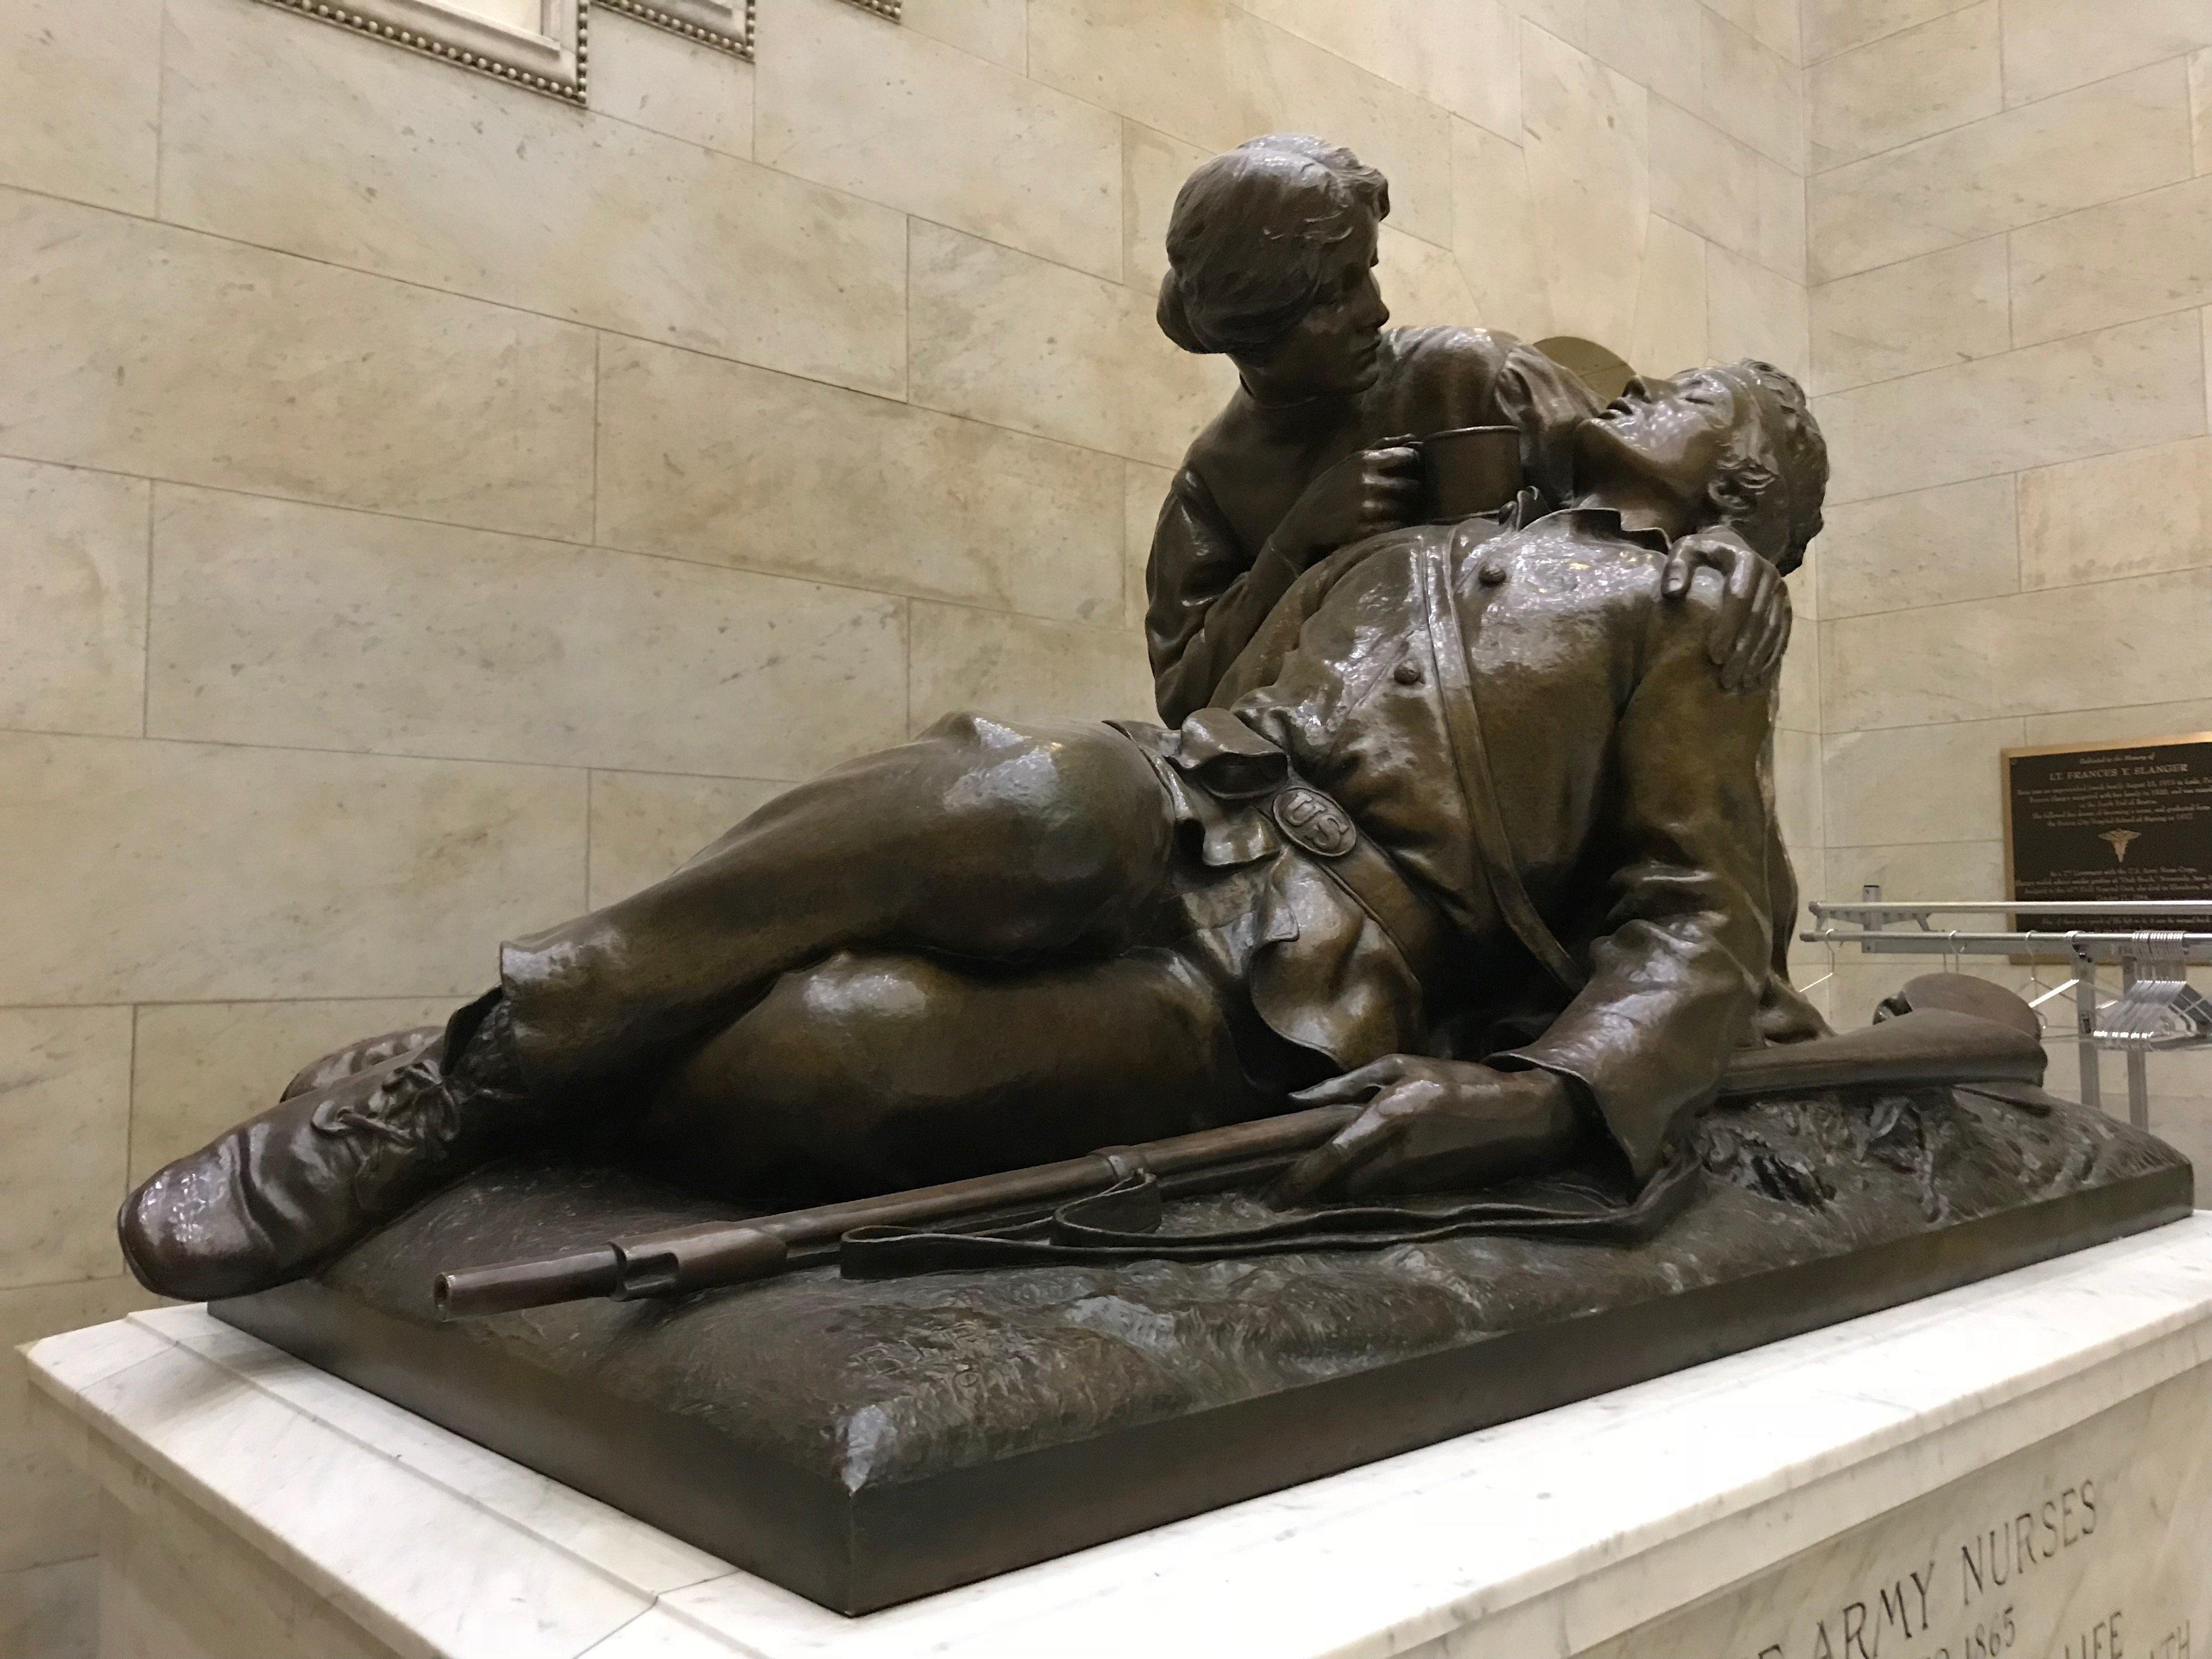 Civil War Army Nurses Memorial by Bela Lyon Pratt Photography by Edda Kirsch